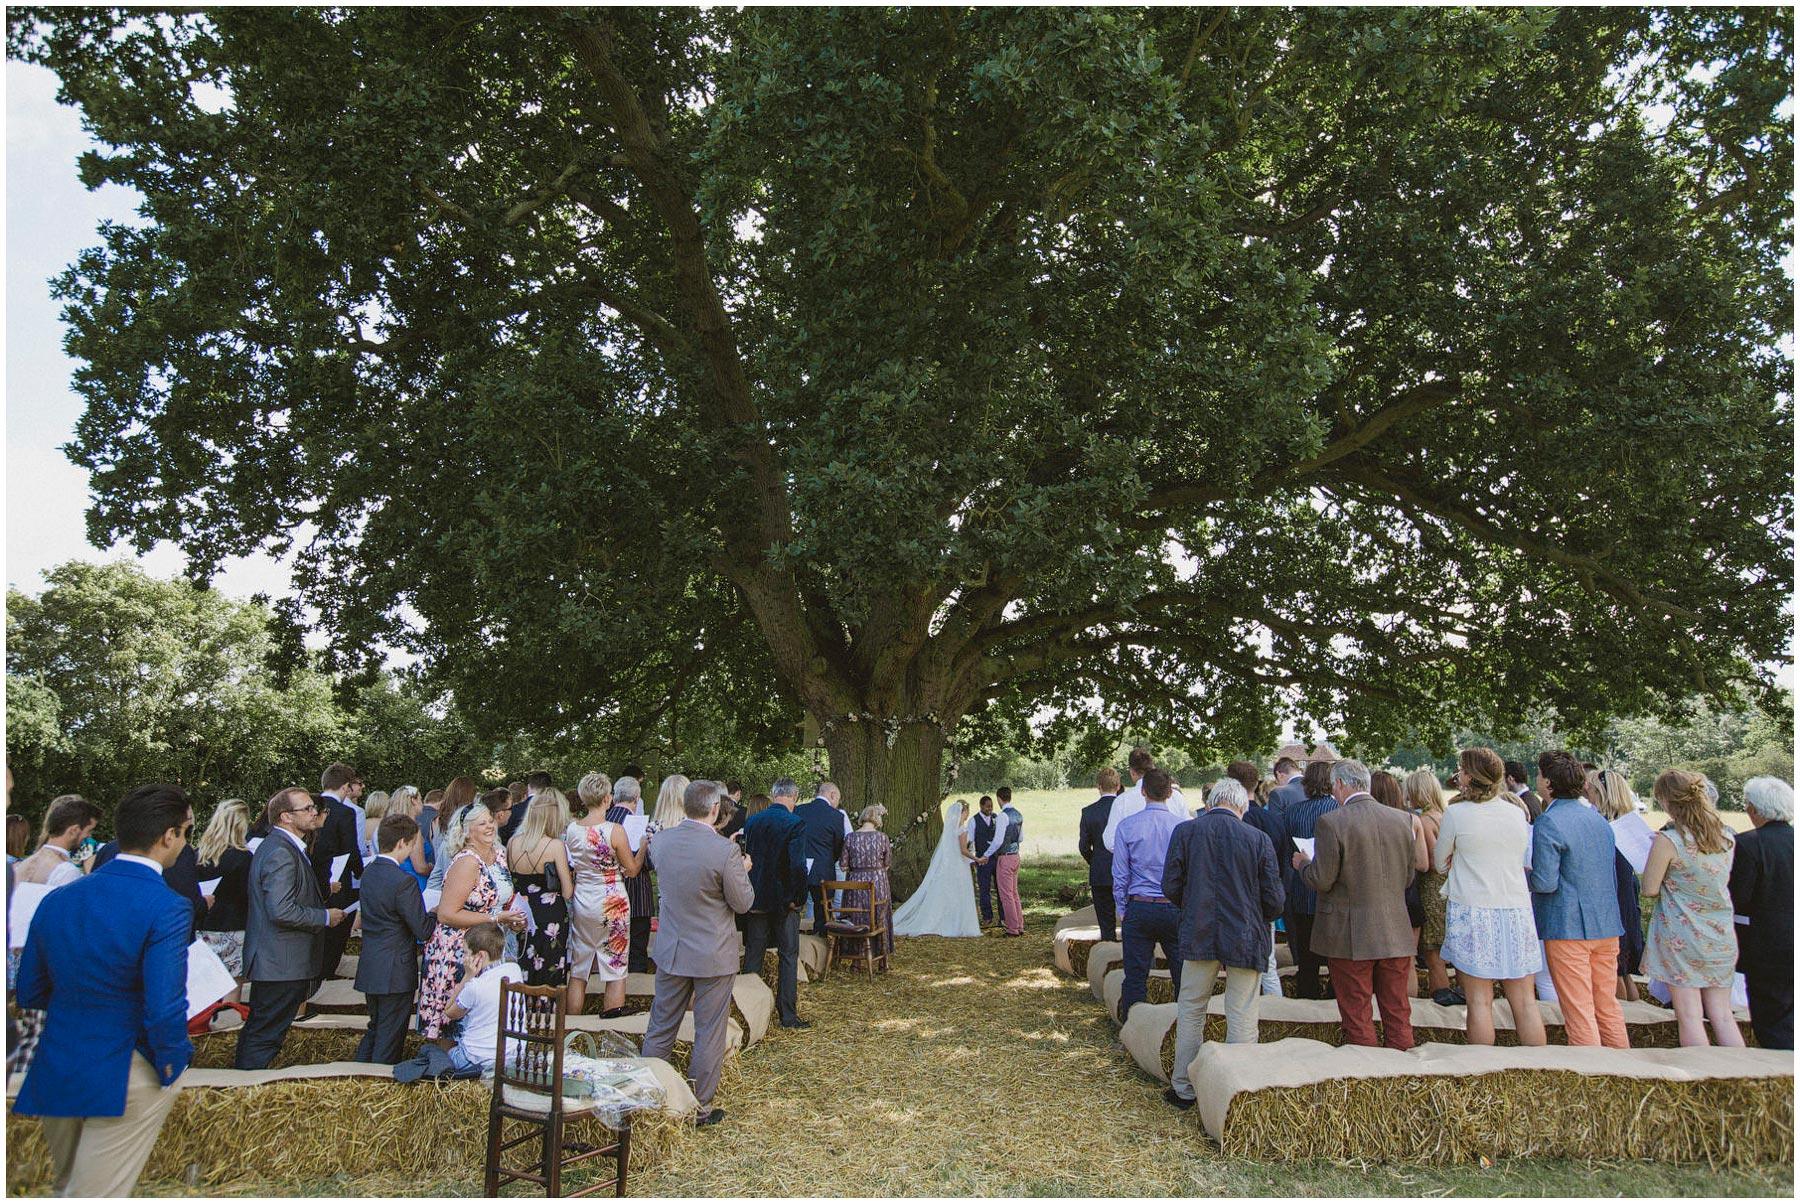 Kent-Festival-Tipi-wedding-photography_0079